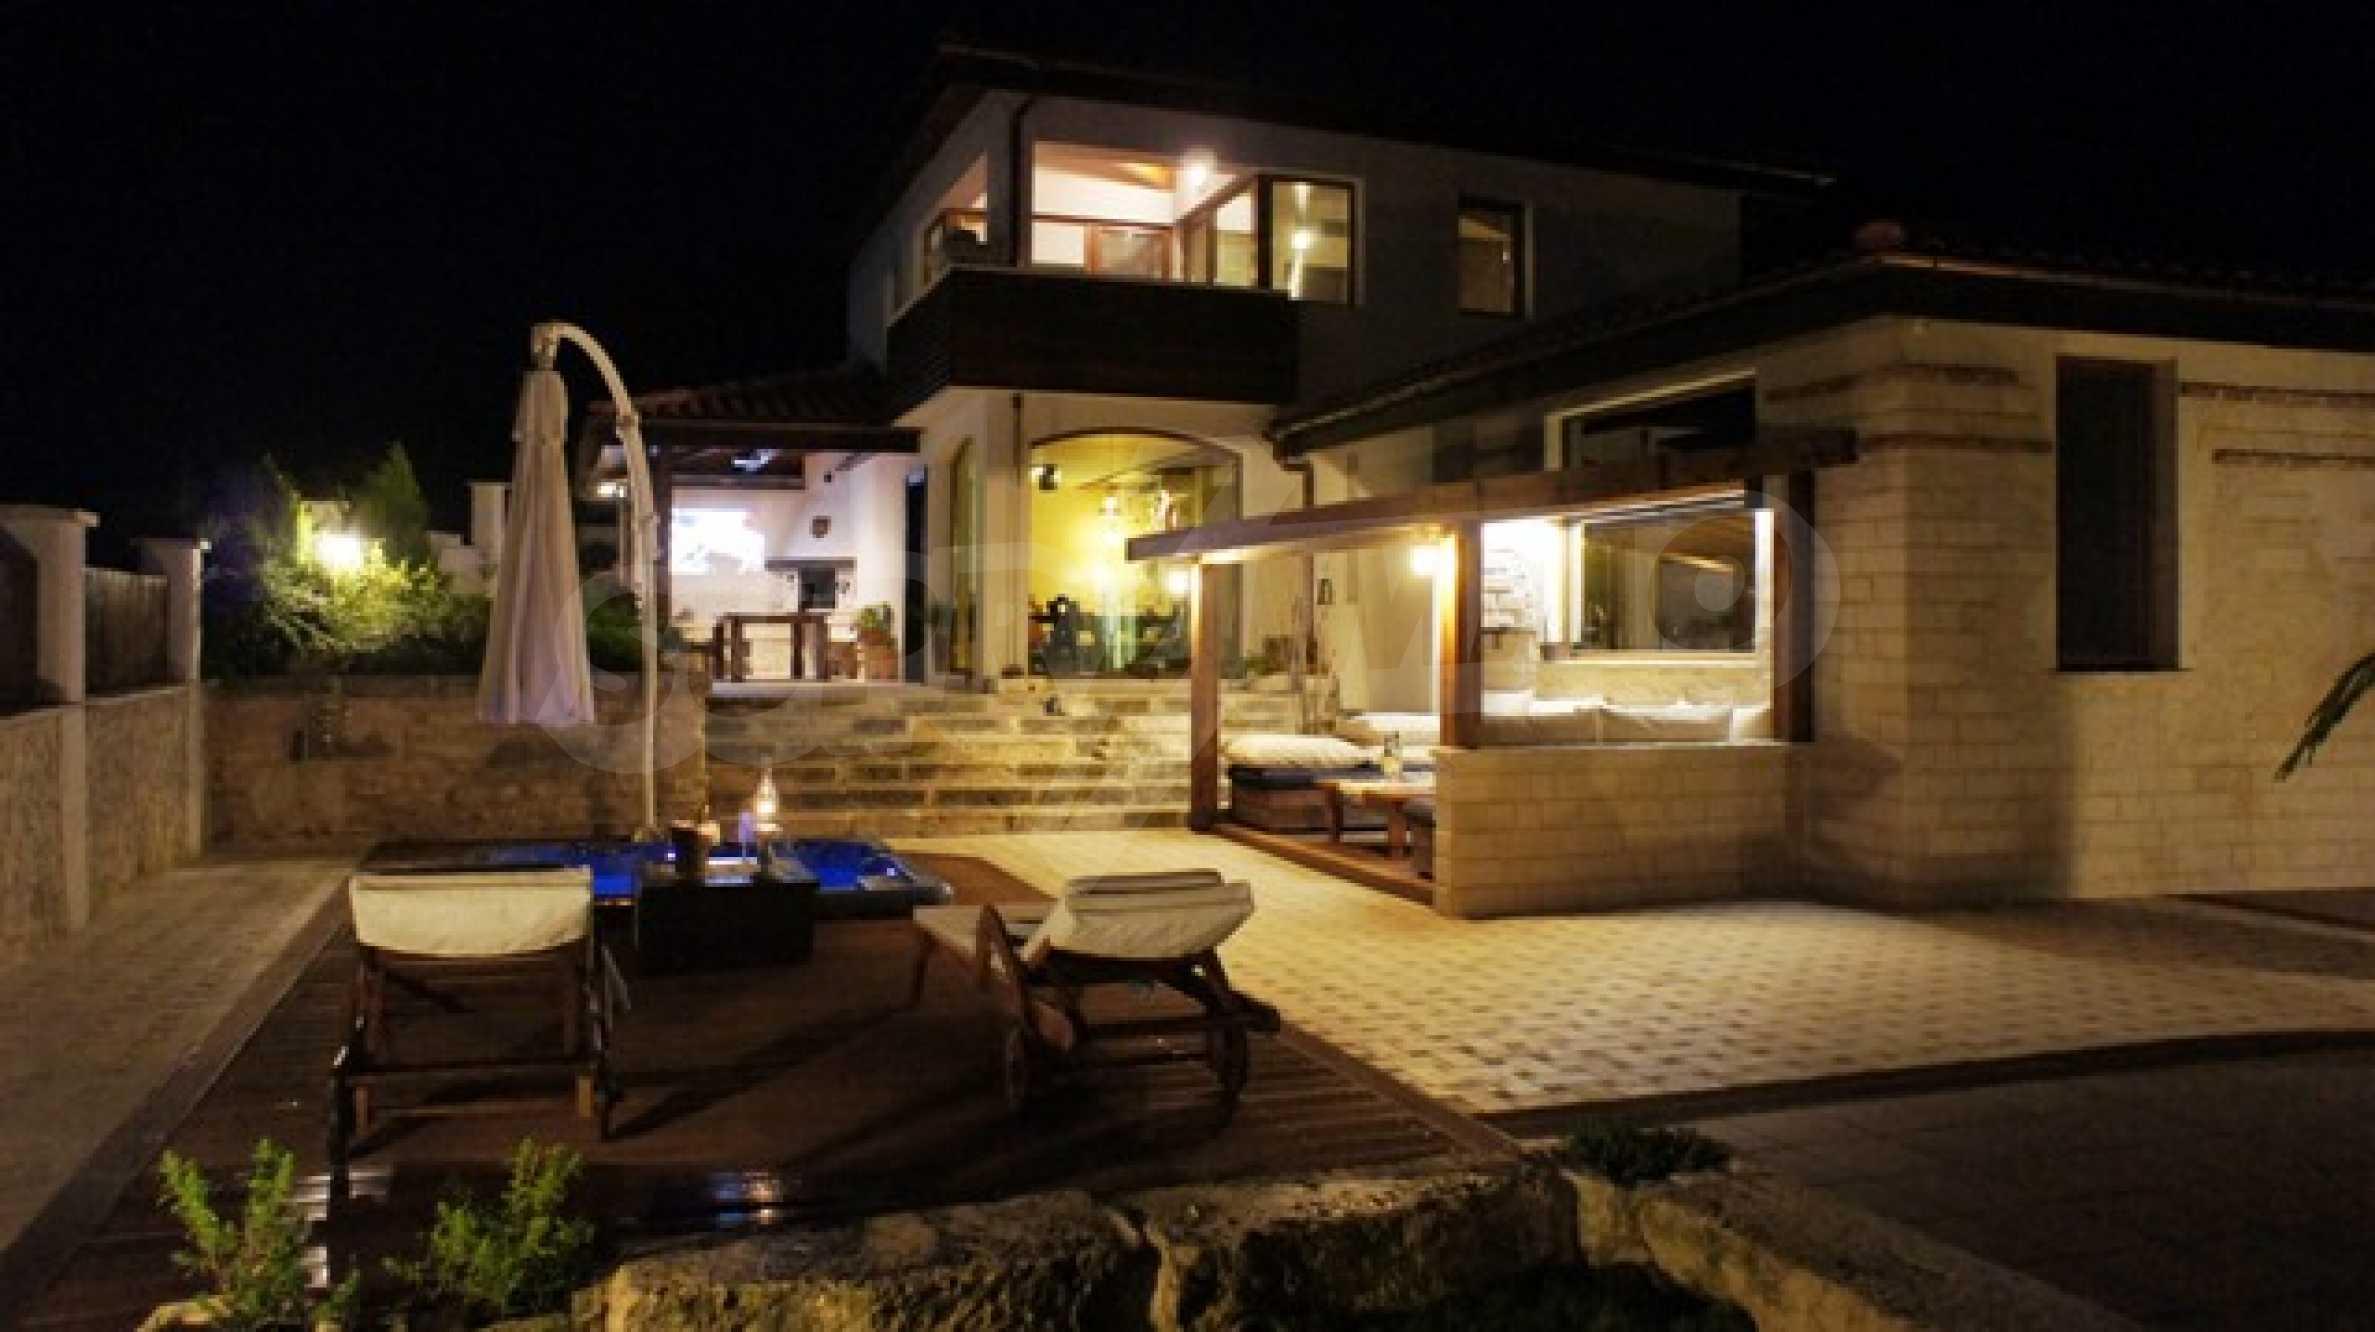 The Mediterranean style - a sense of luxury 56